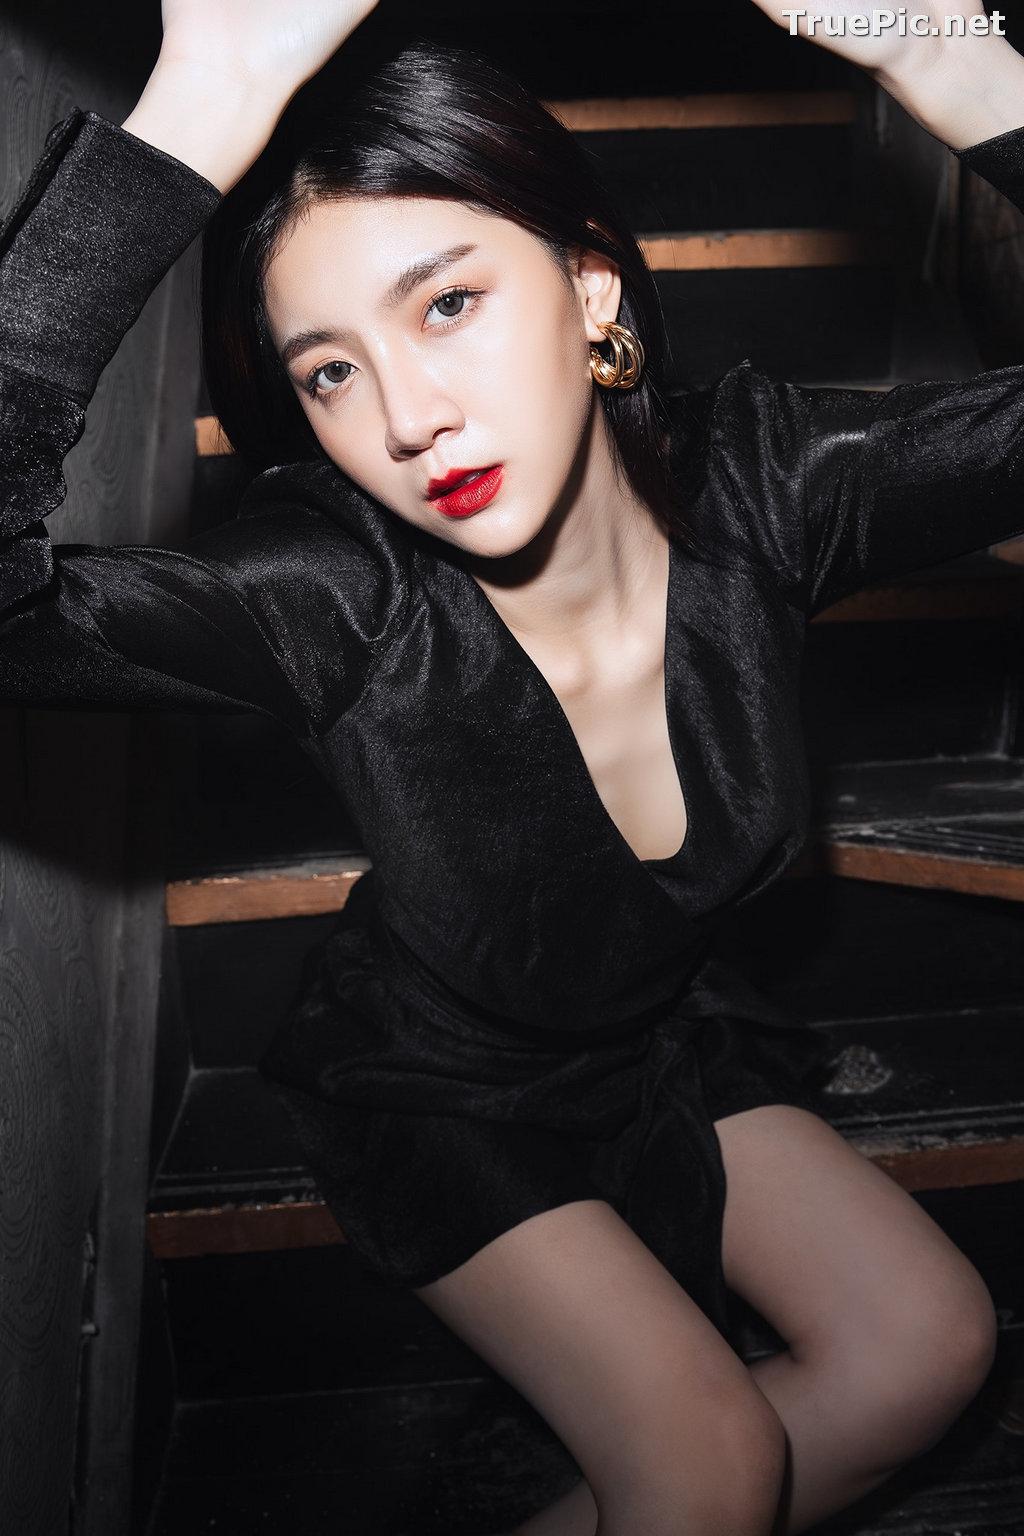 Image Thailand Model - Sasi Ngiunwan - Black For SiamNight - TruePic.net - Picture-20